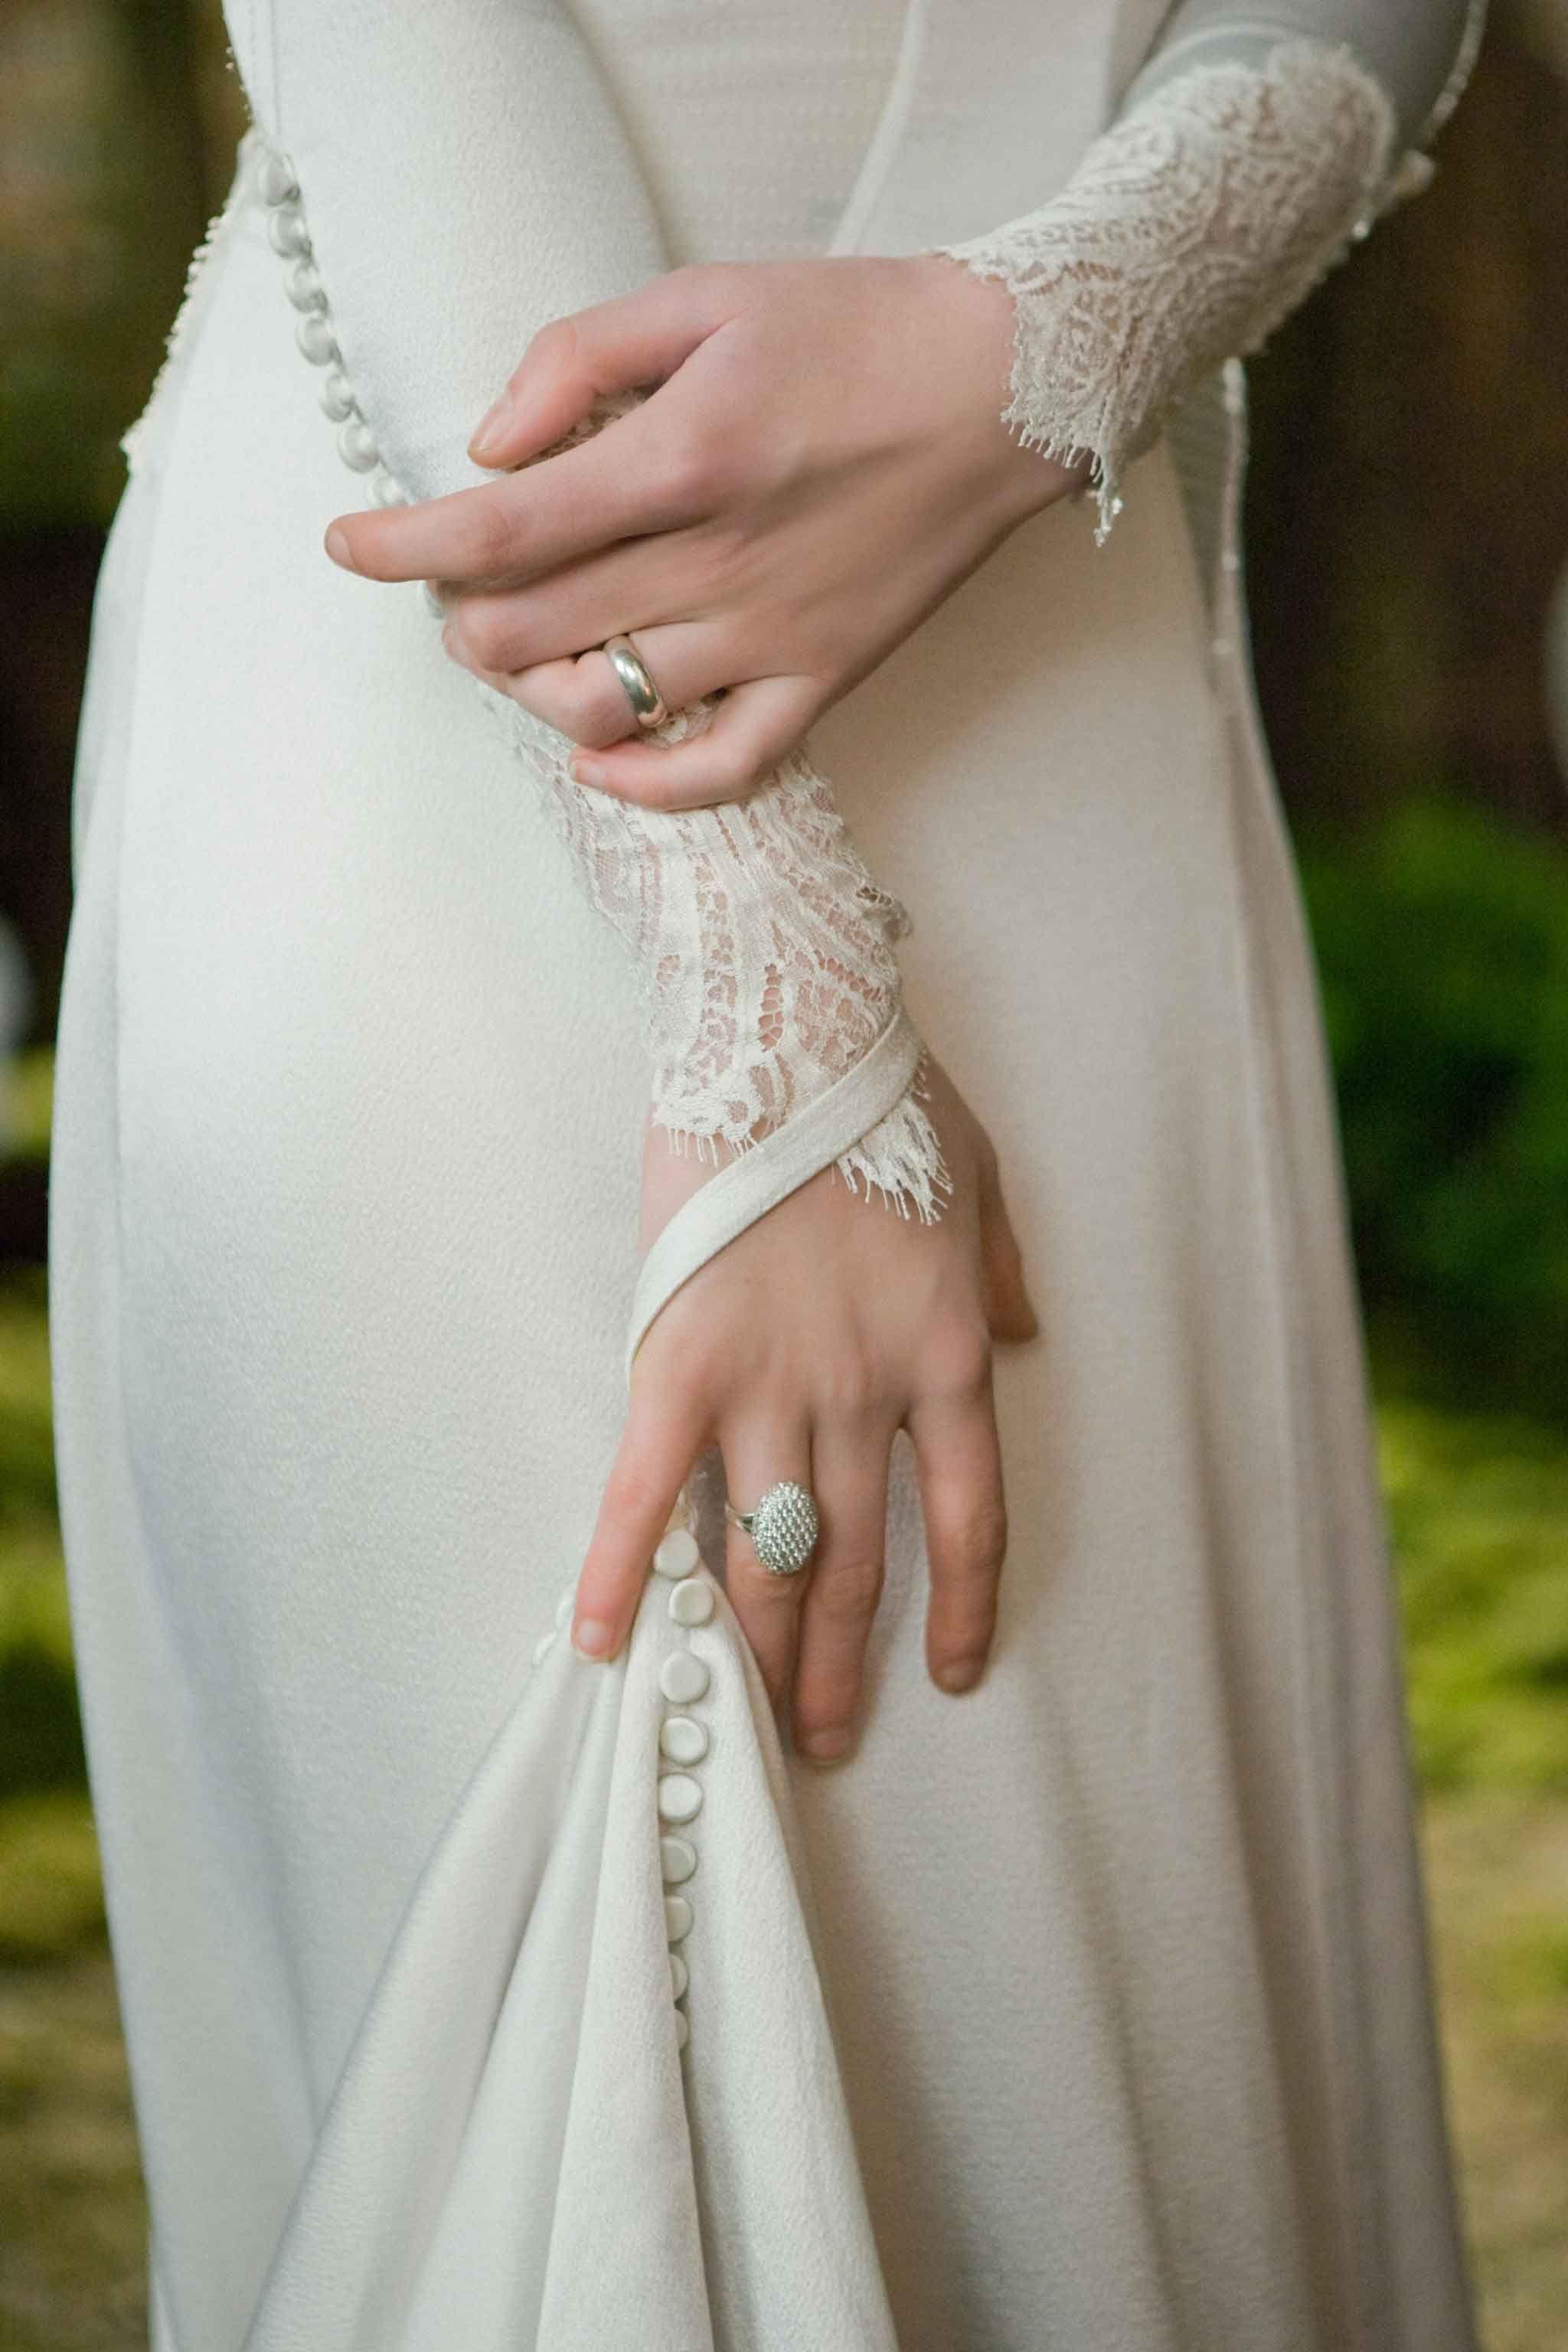 Bella Swan In The Movie The Twilight Saga Breaking Dawn Part 1 Breaking Dawn Wedding Dress Bella Wedding Dress Bella Swan Wedding Dress